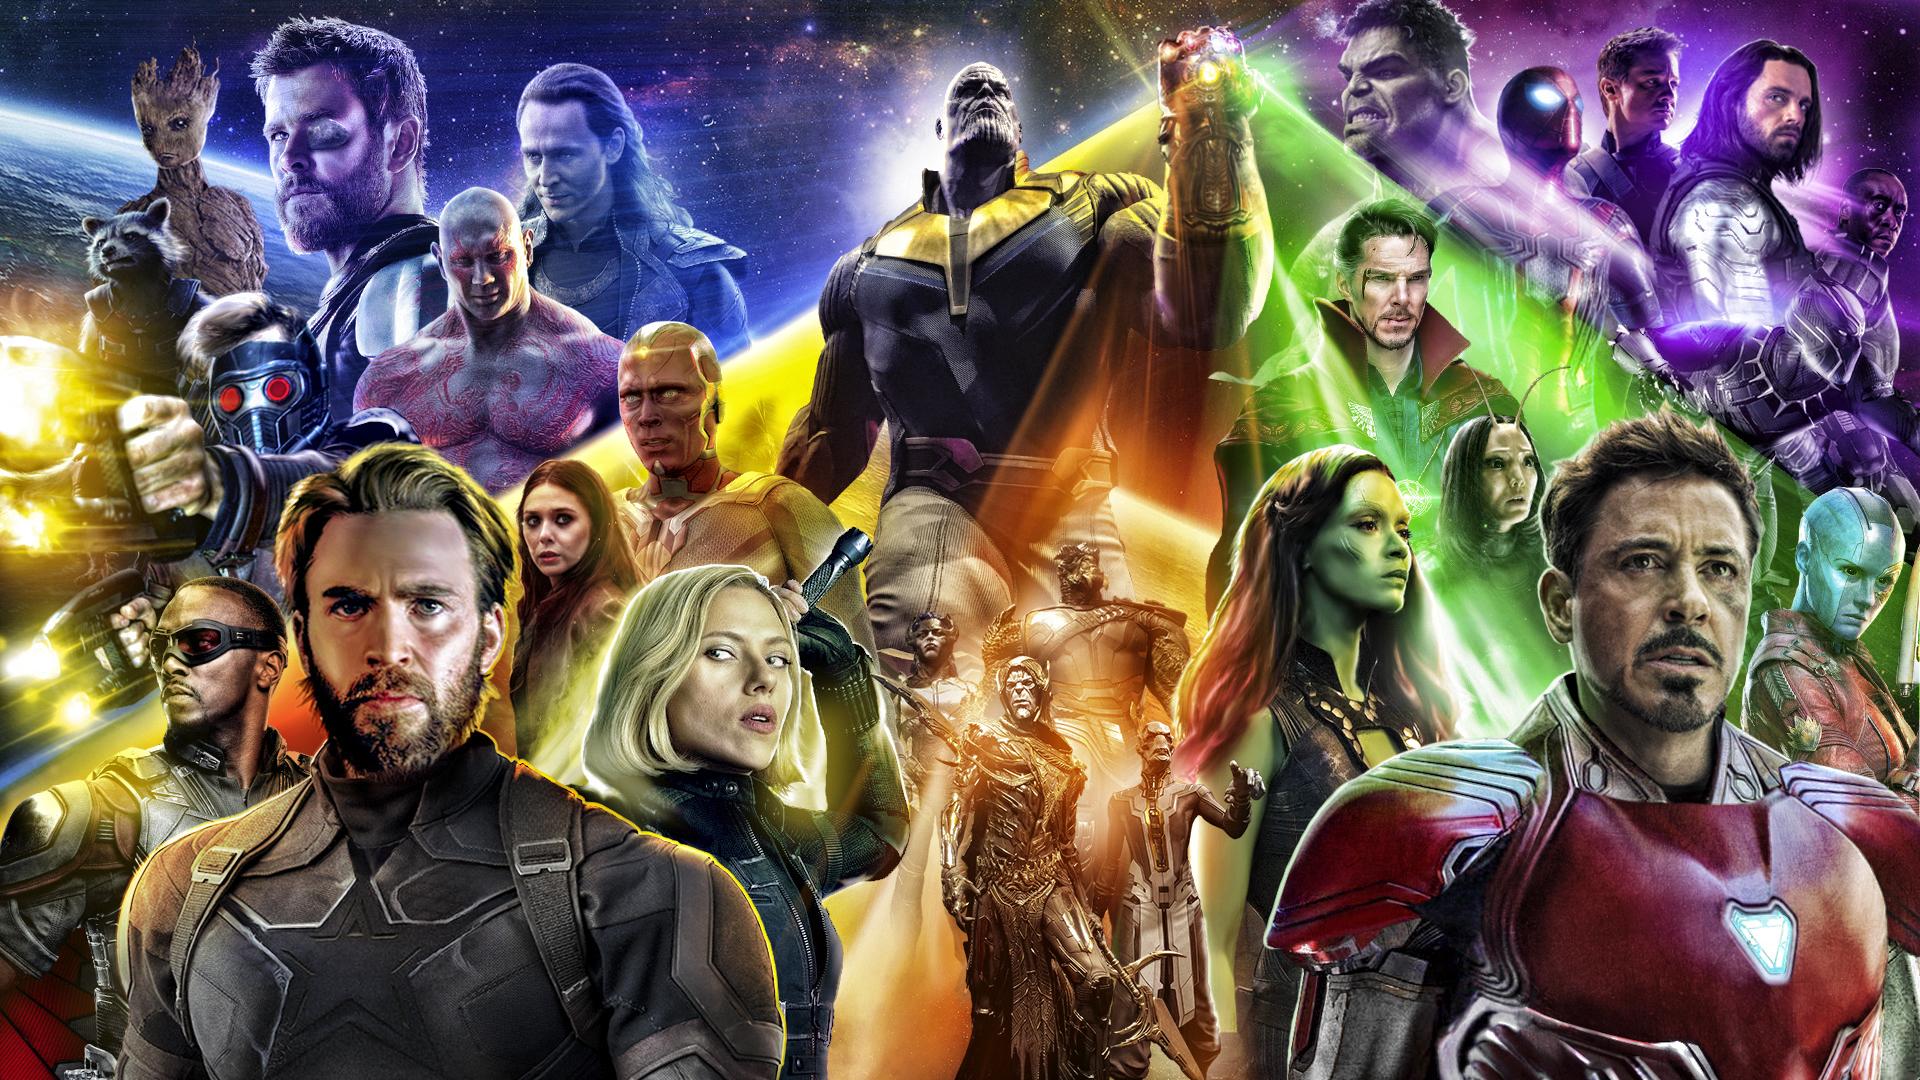 download avengers infinty war 2018 poster 2048x1152 resolution full